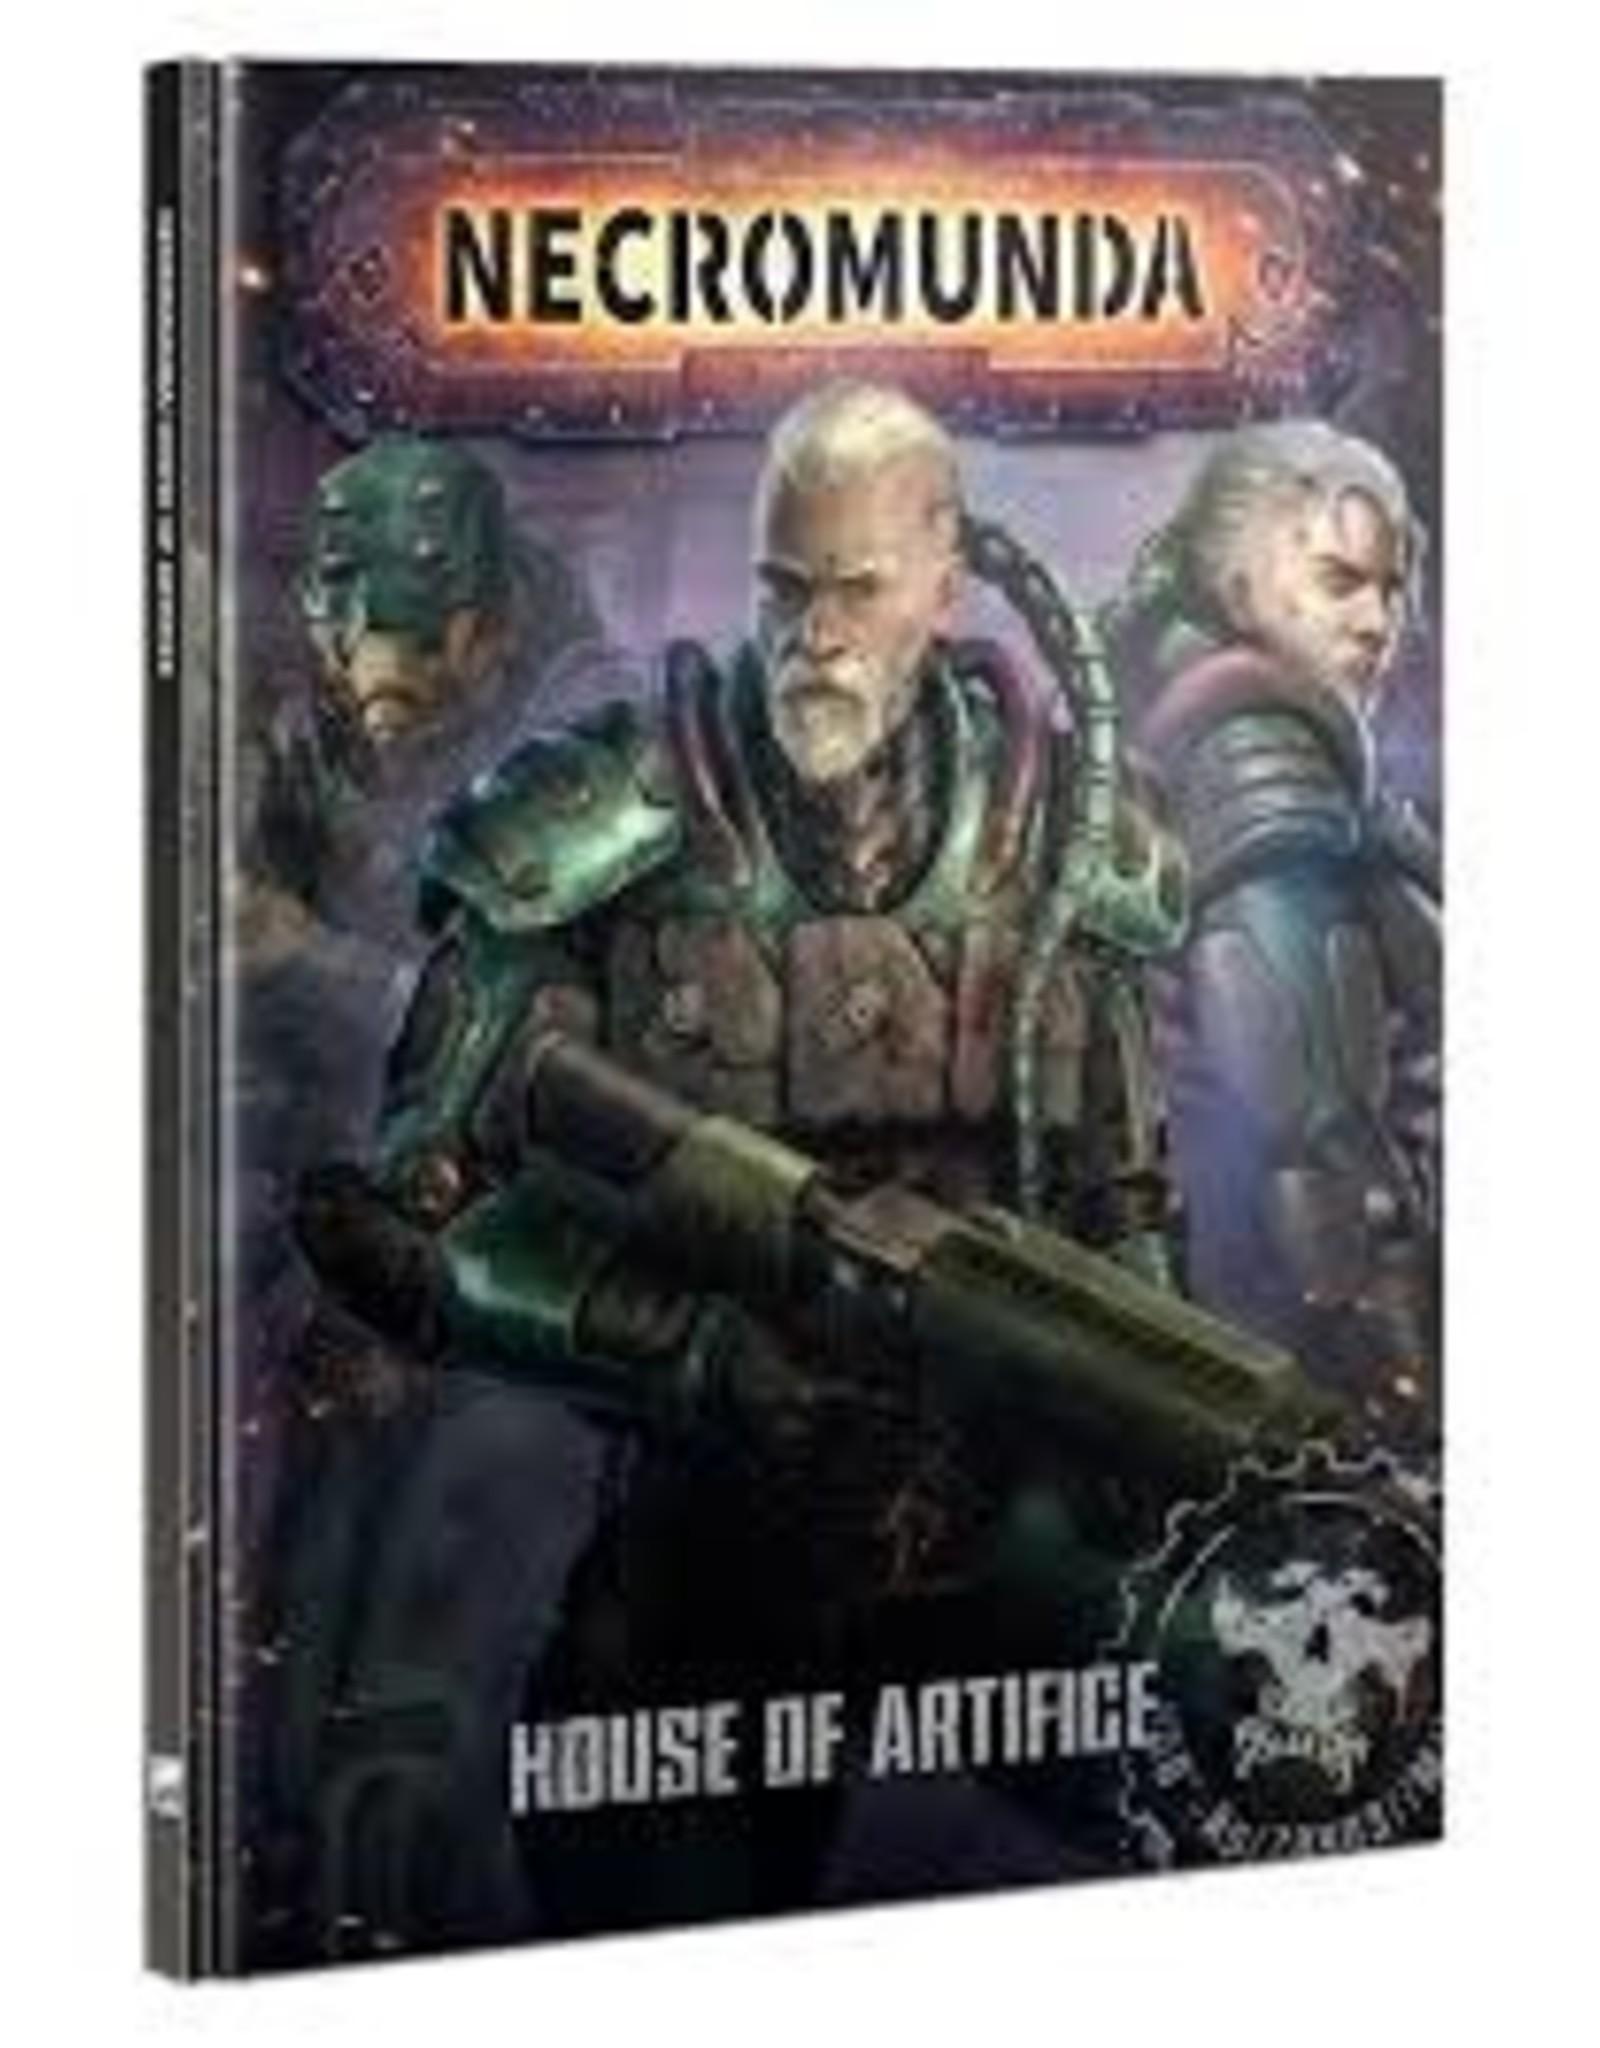 Necromunda Necromunda: House of Artifice